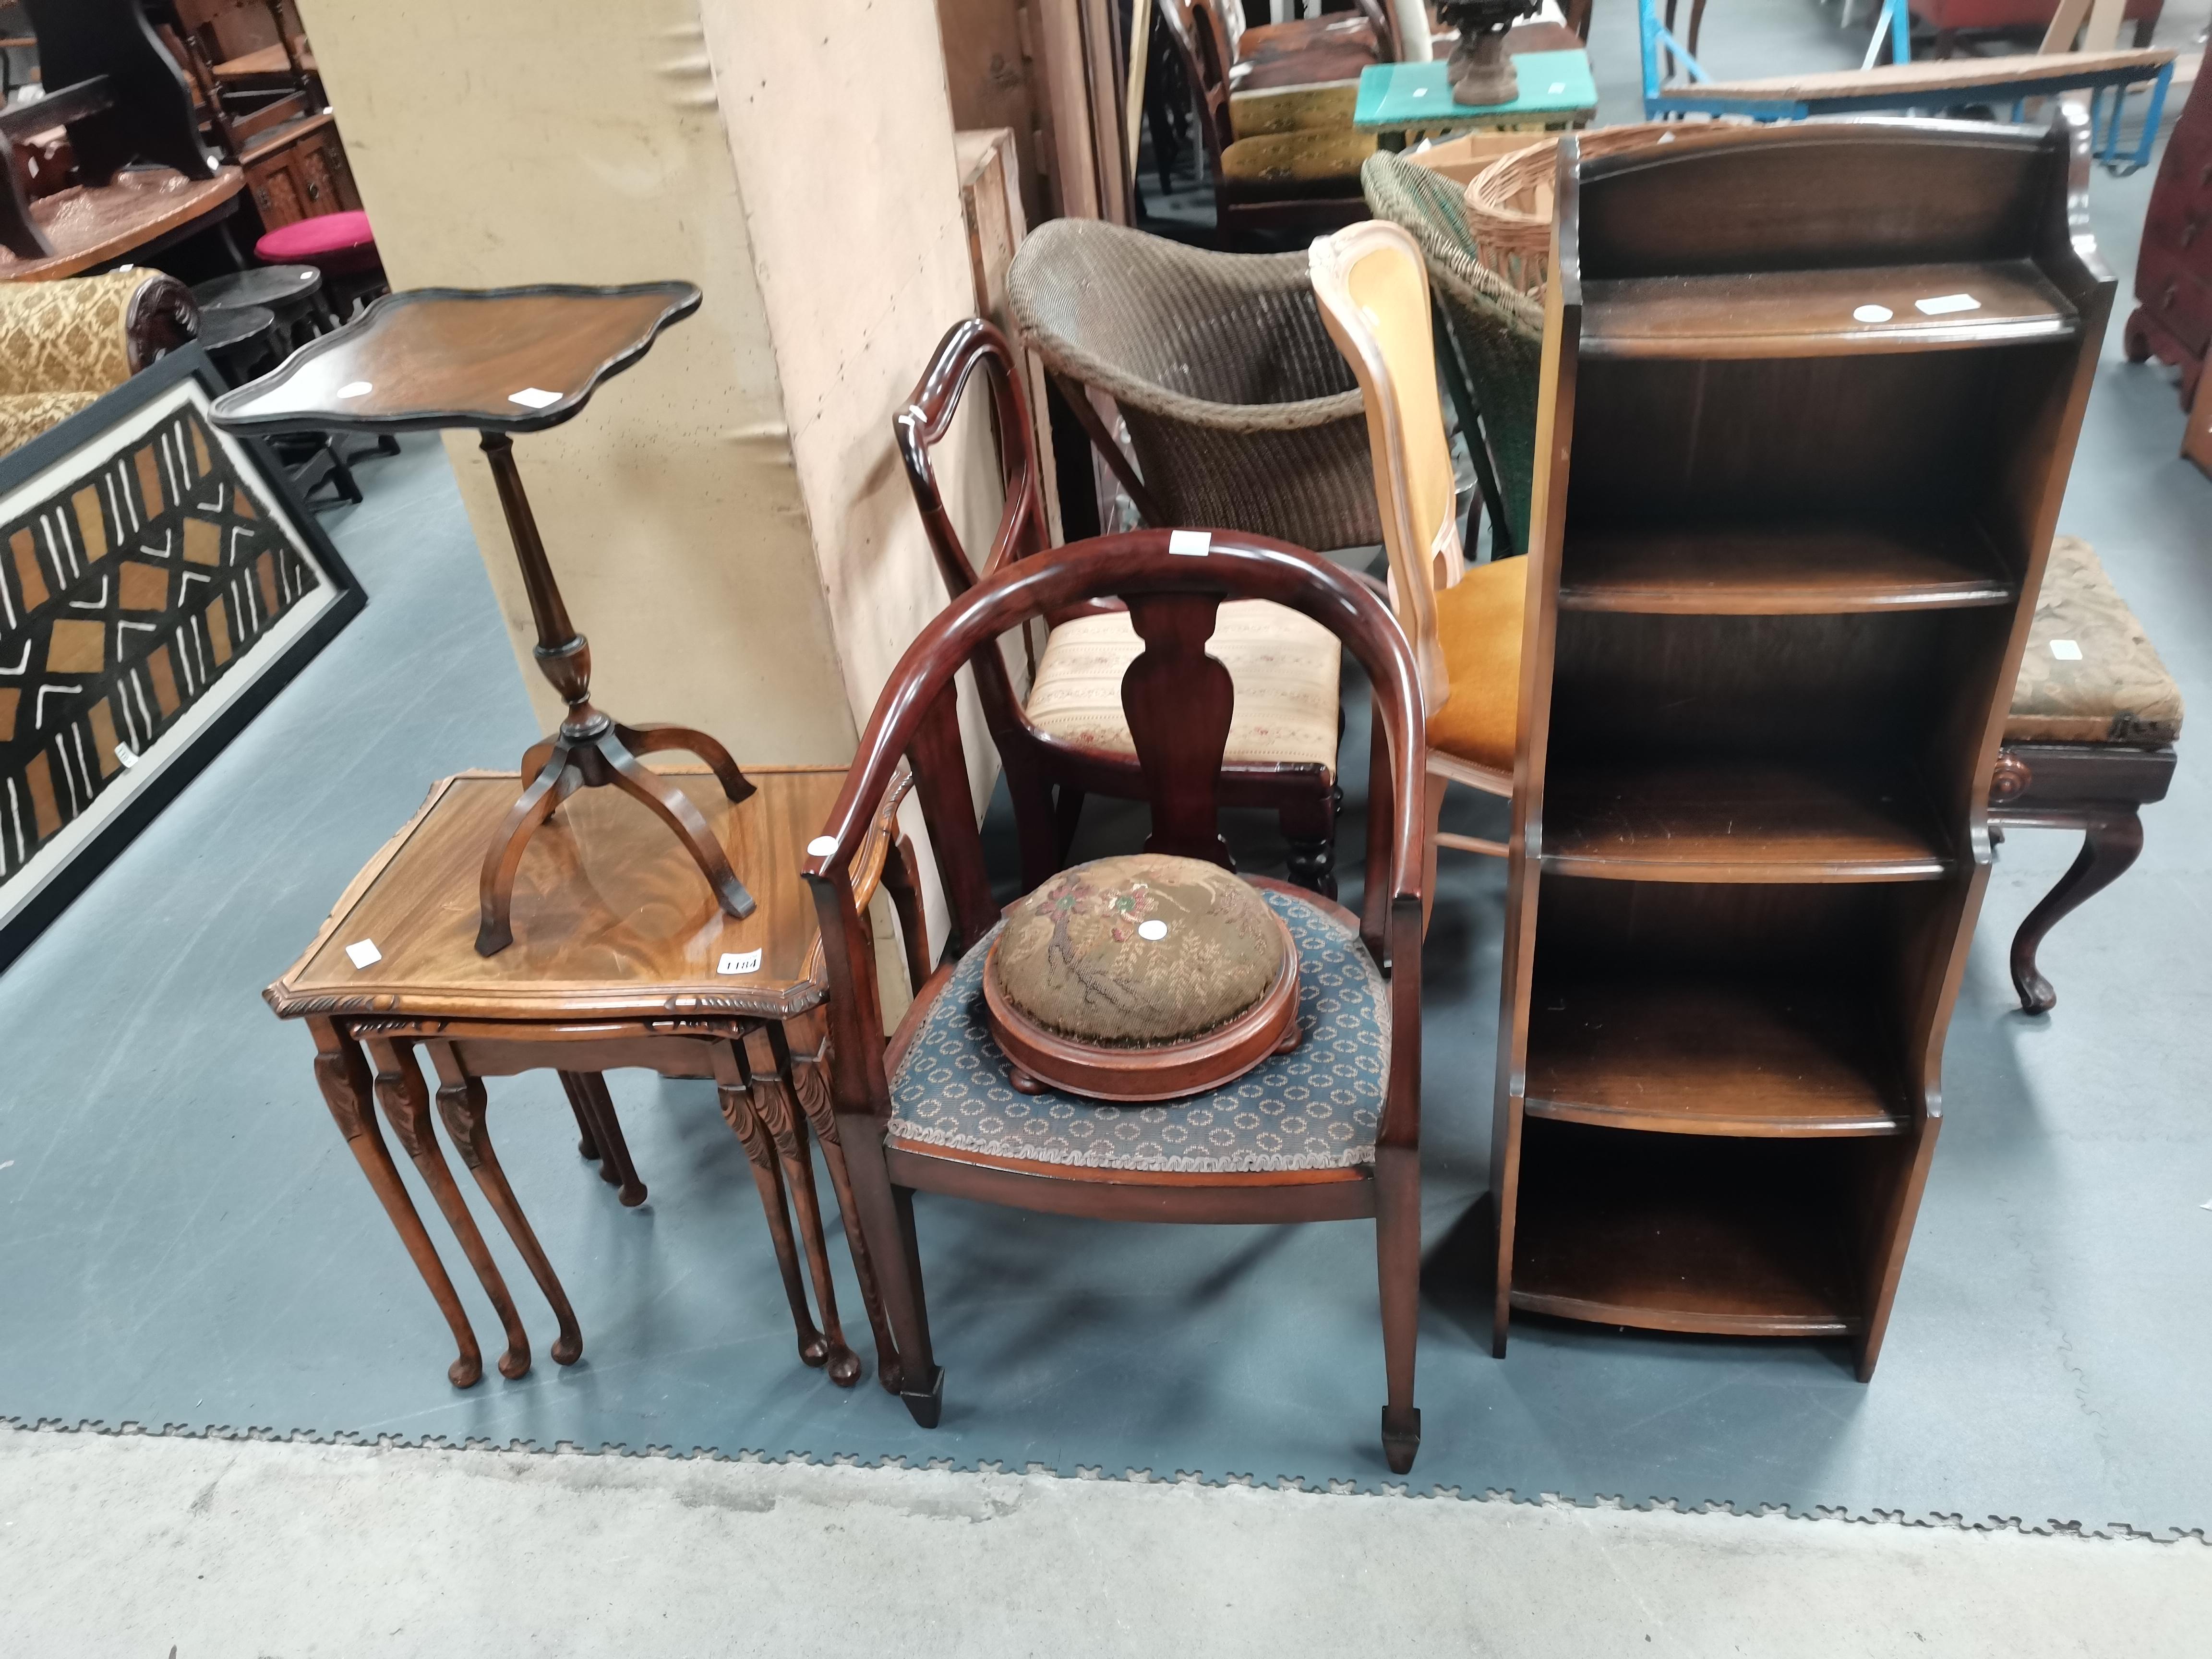 Antique chair, bookcase etc